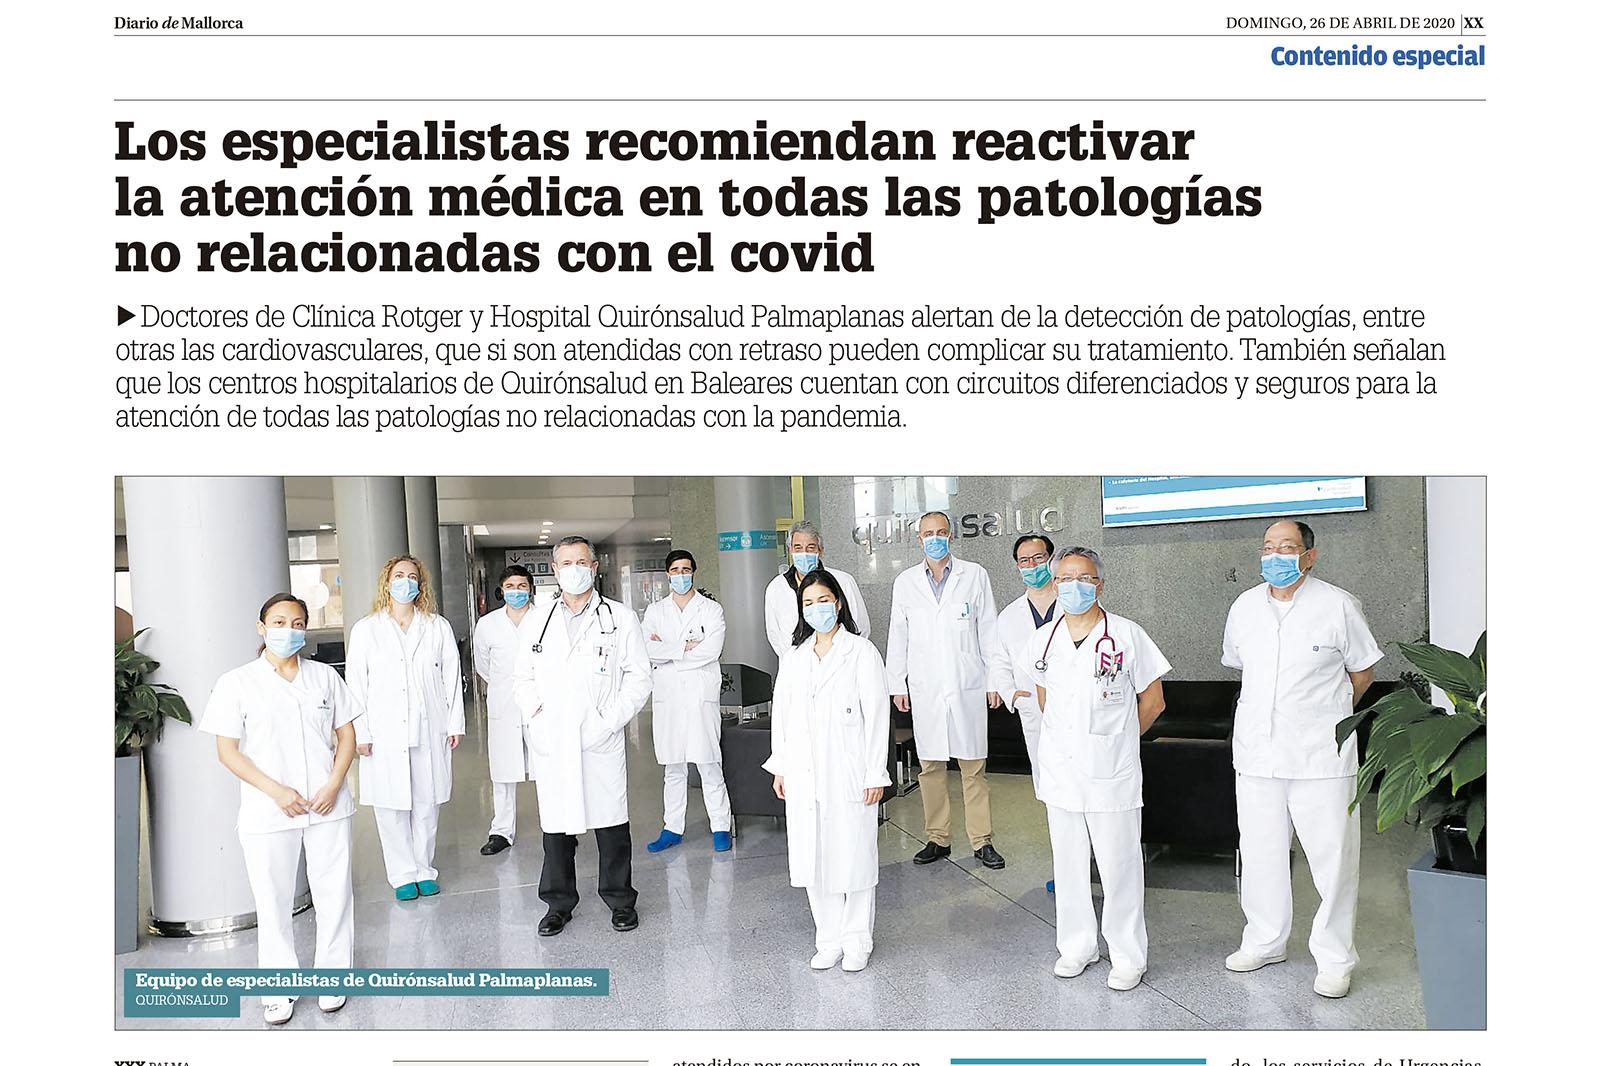 DM-Activación-Asistencia-Sanitaria-Clínica-Rotger-Hospital-Quirónsalud-Palmaplanas